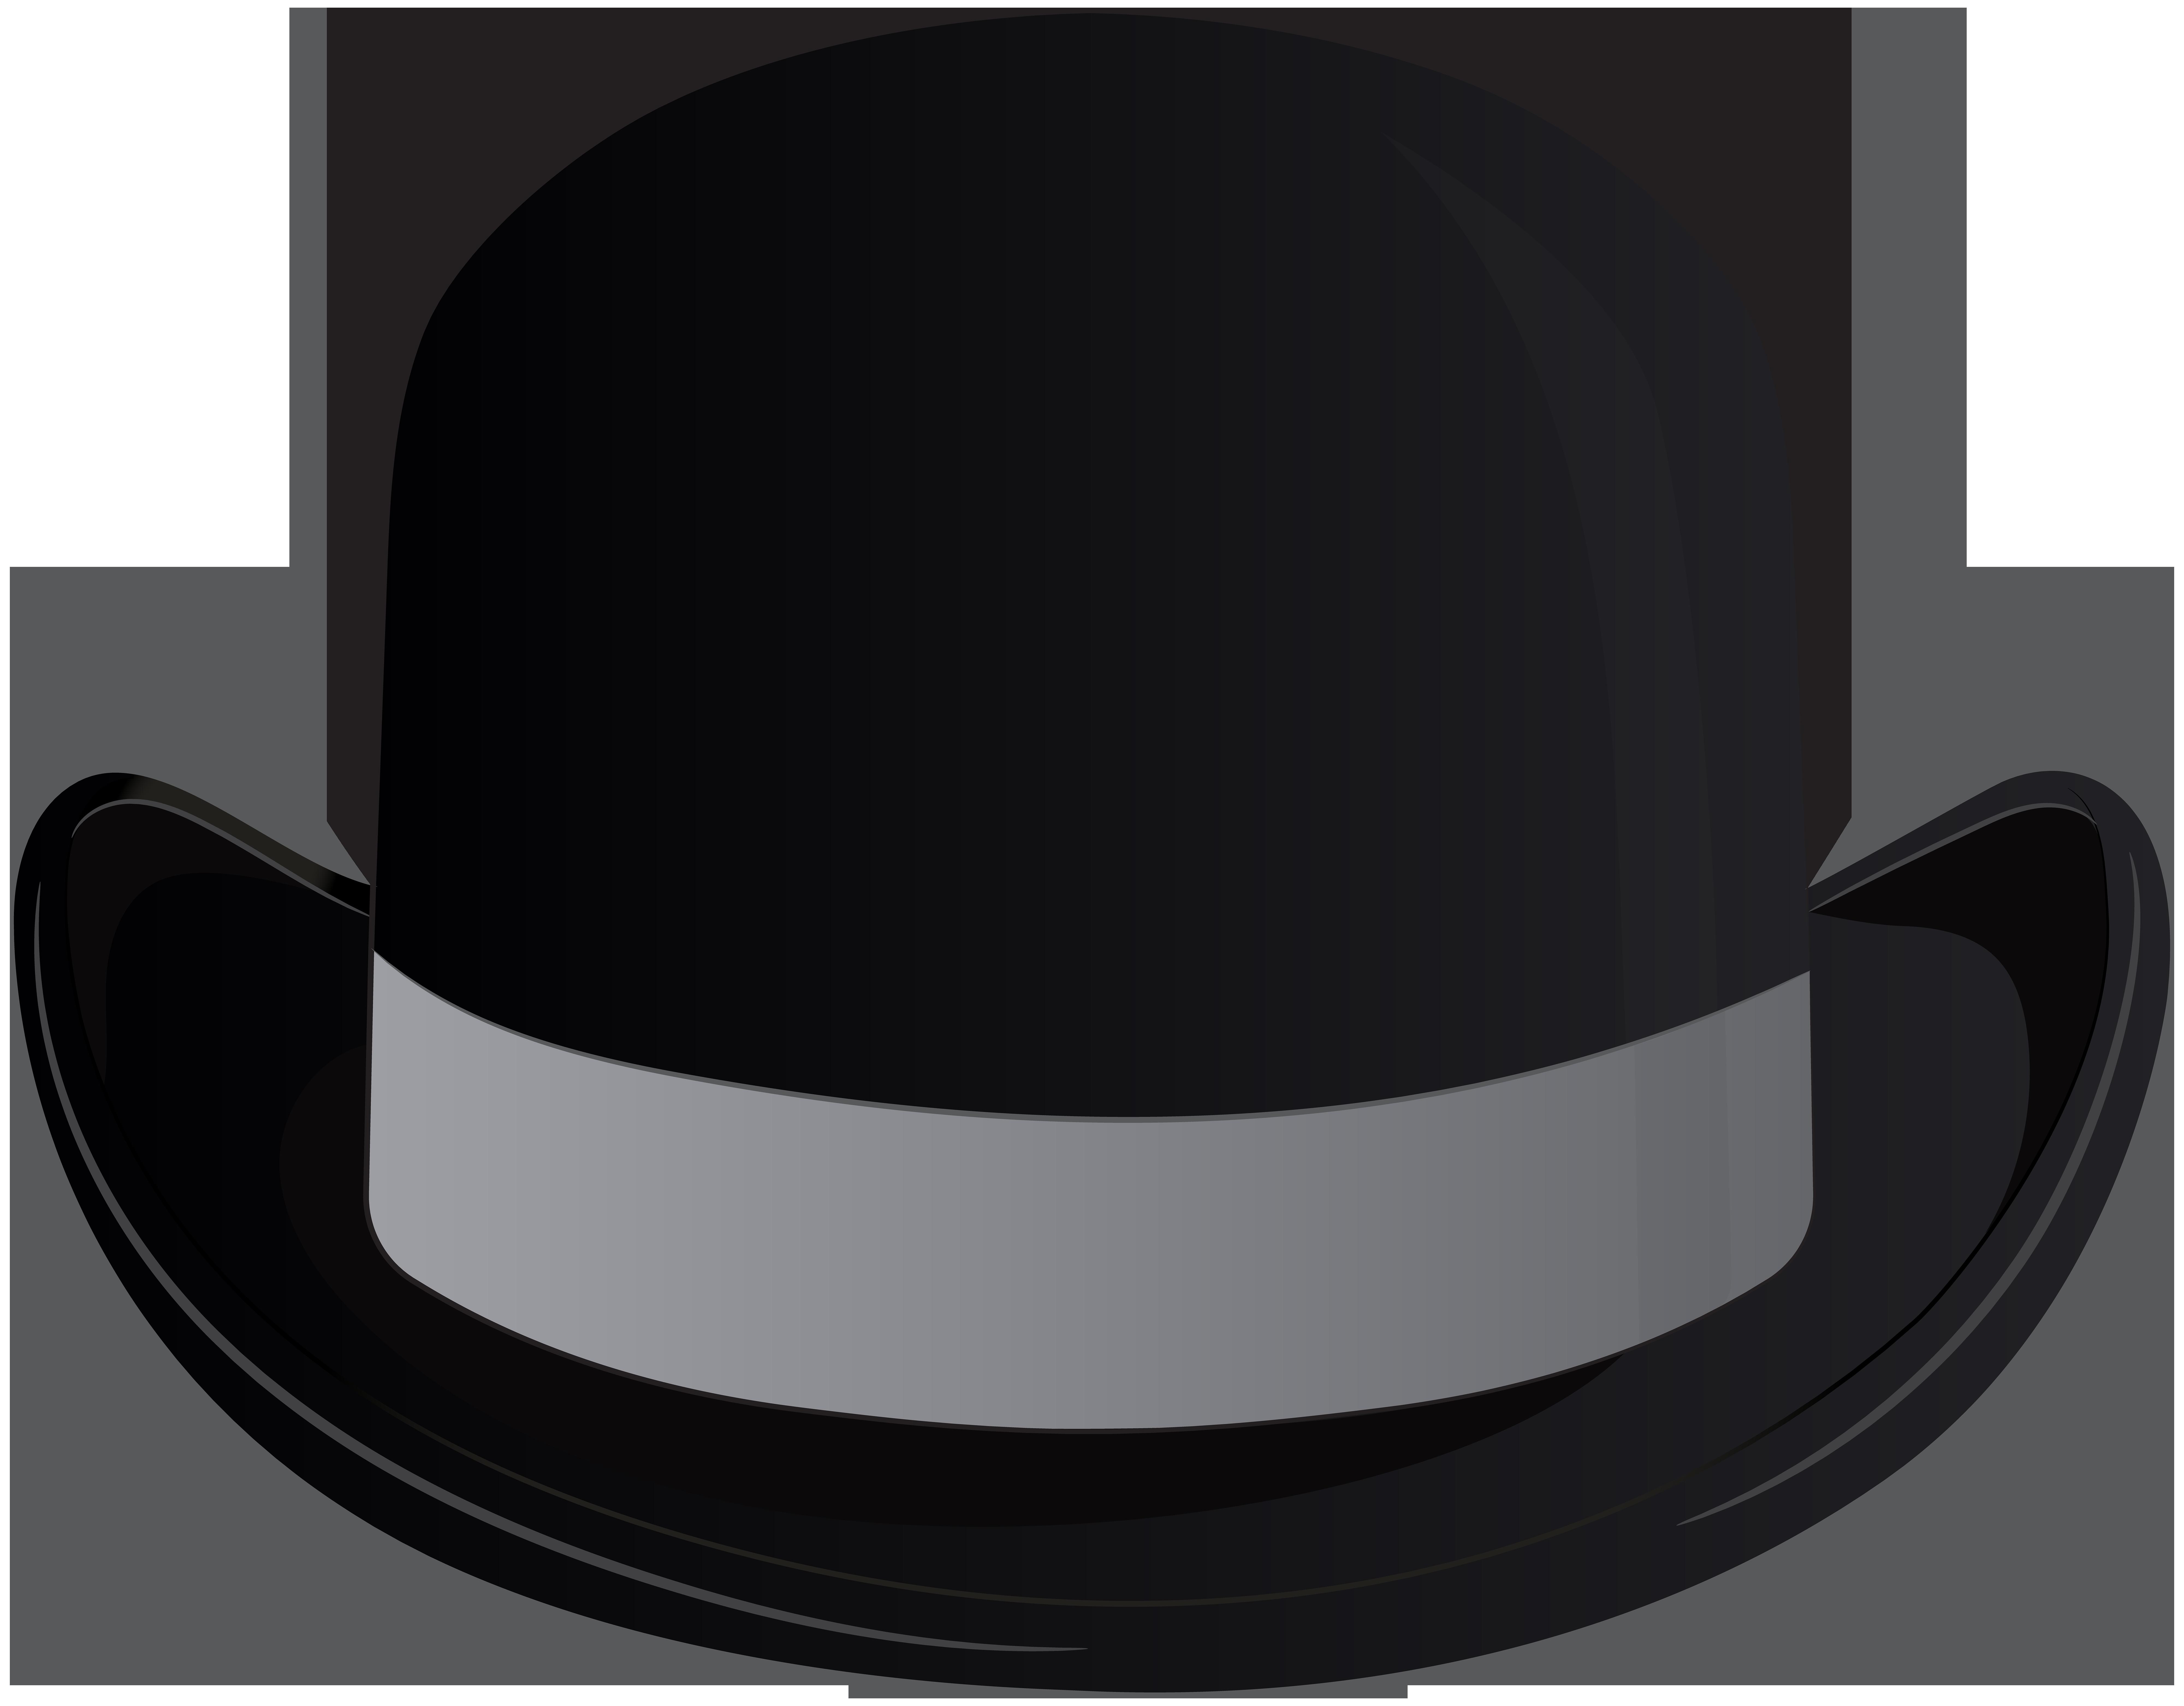 Hat clipart png png freeuse download Bowler Hat Transparent Clip Art PNG Image | Gallery ... png freeuse download